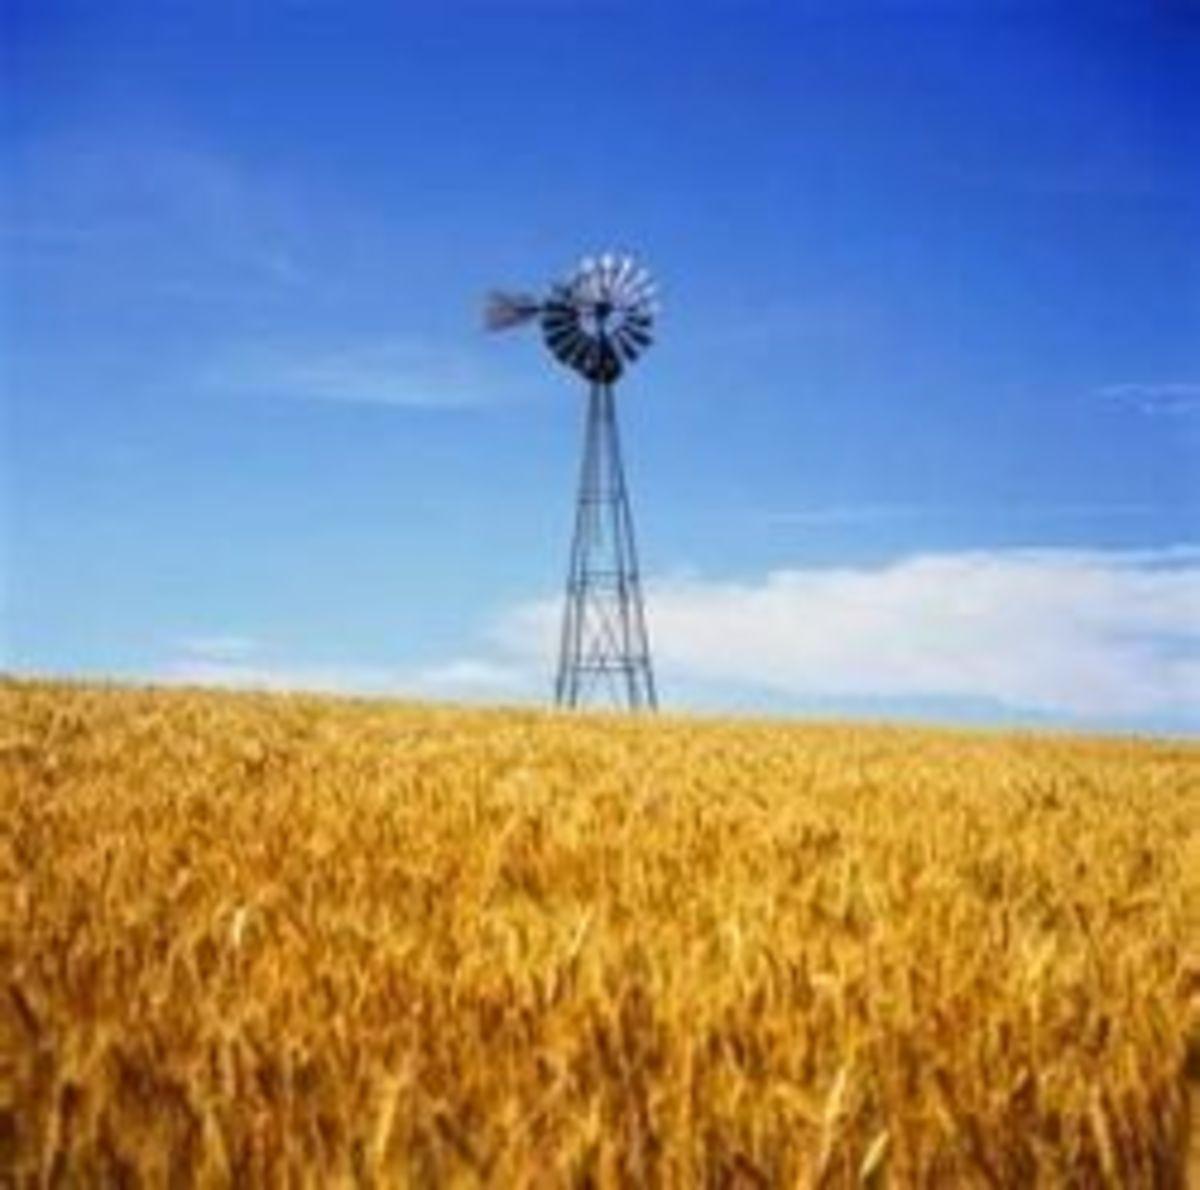 Image credit: http://www.tripadvisor.com/